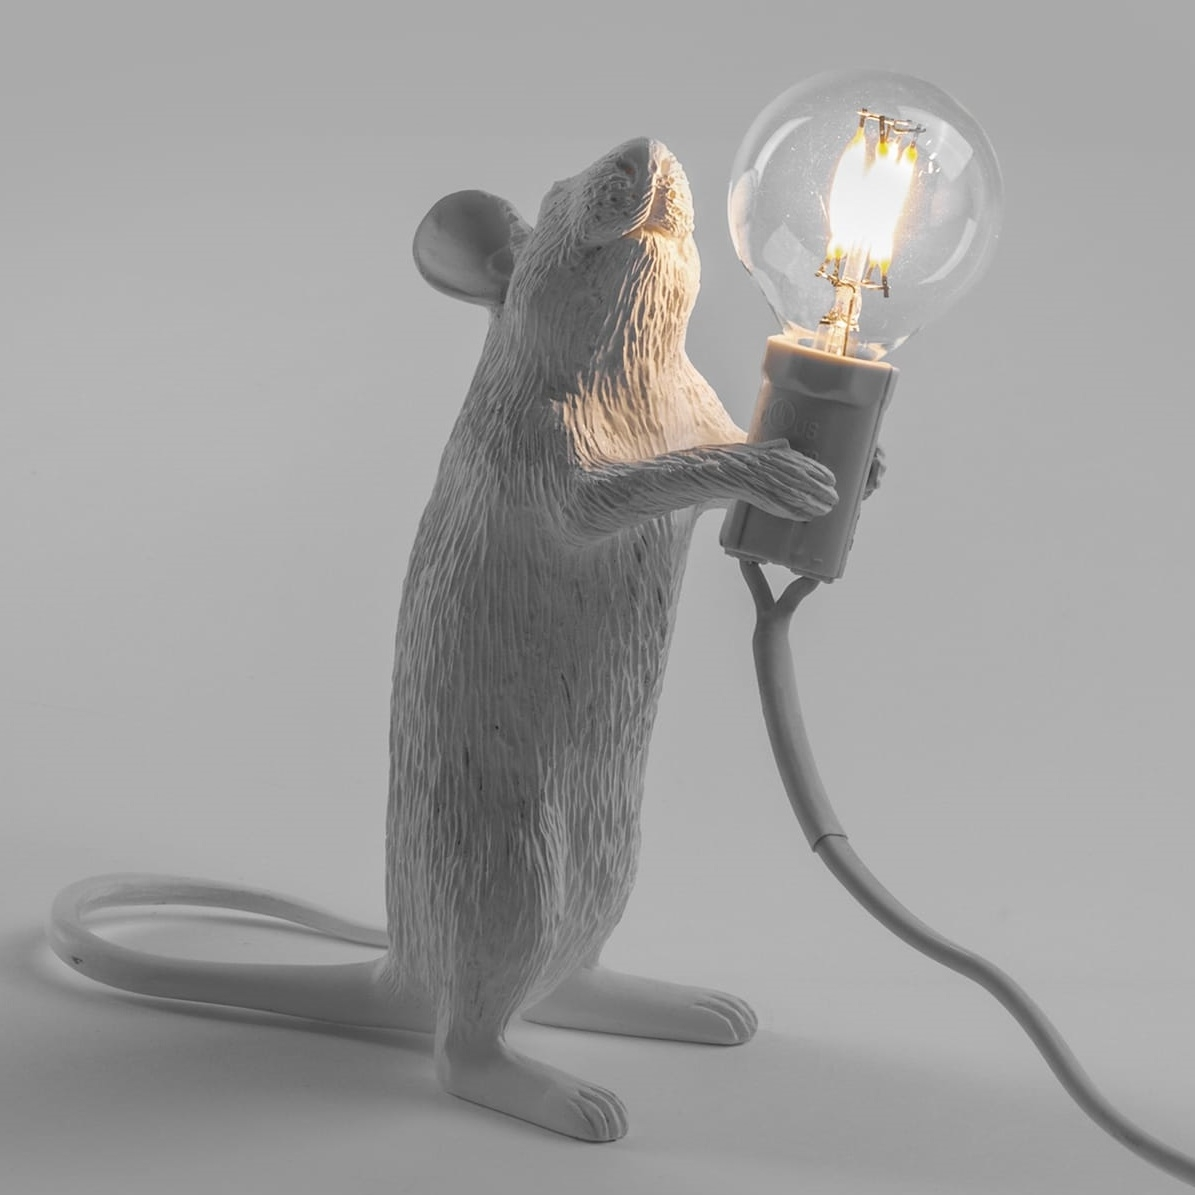 seletti stoln lampy mouse lamp designpropaganda. Black Bedroom Furniture Sets. Home Design Ideas